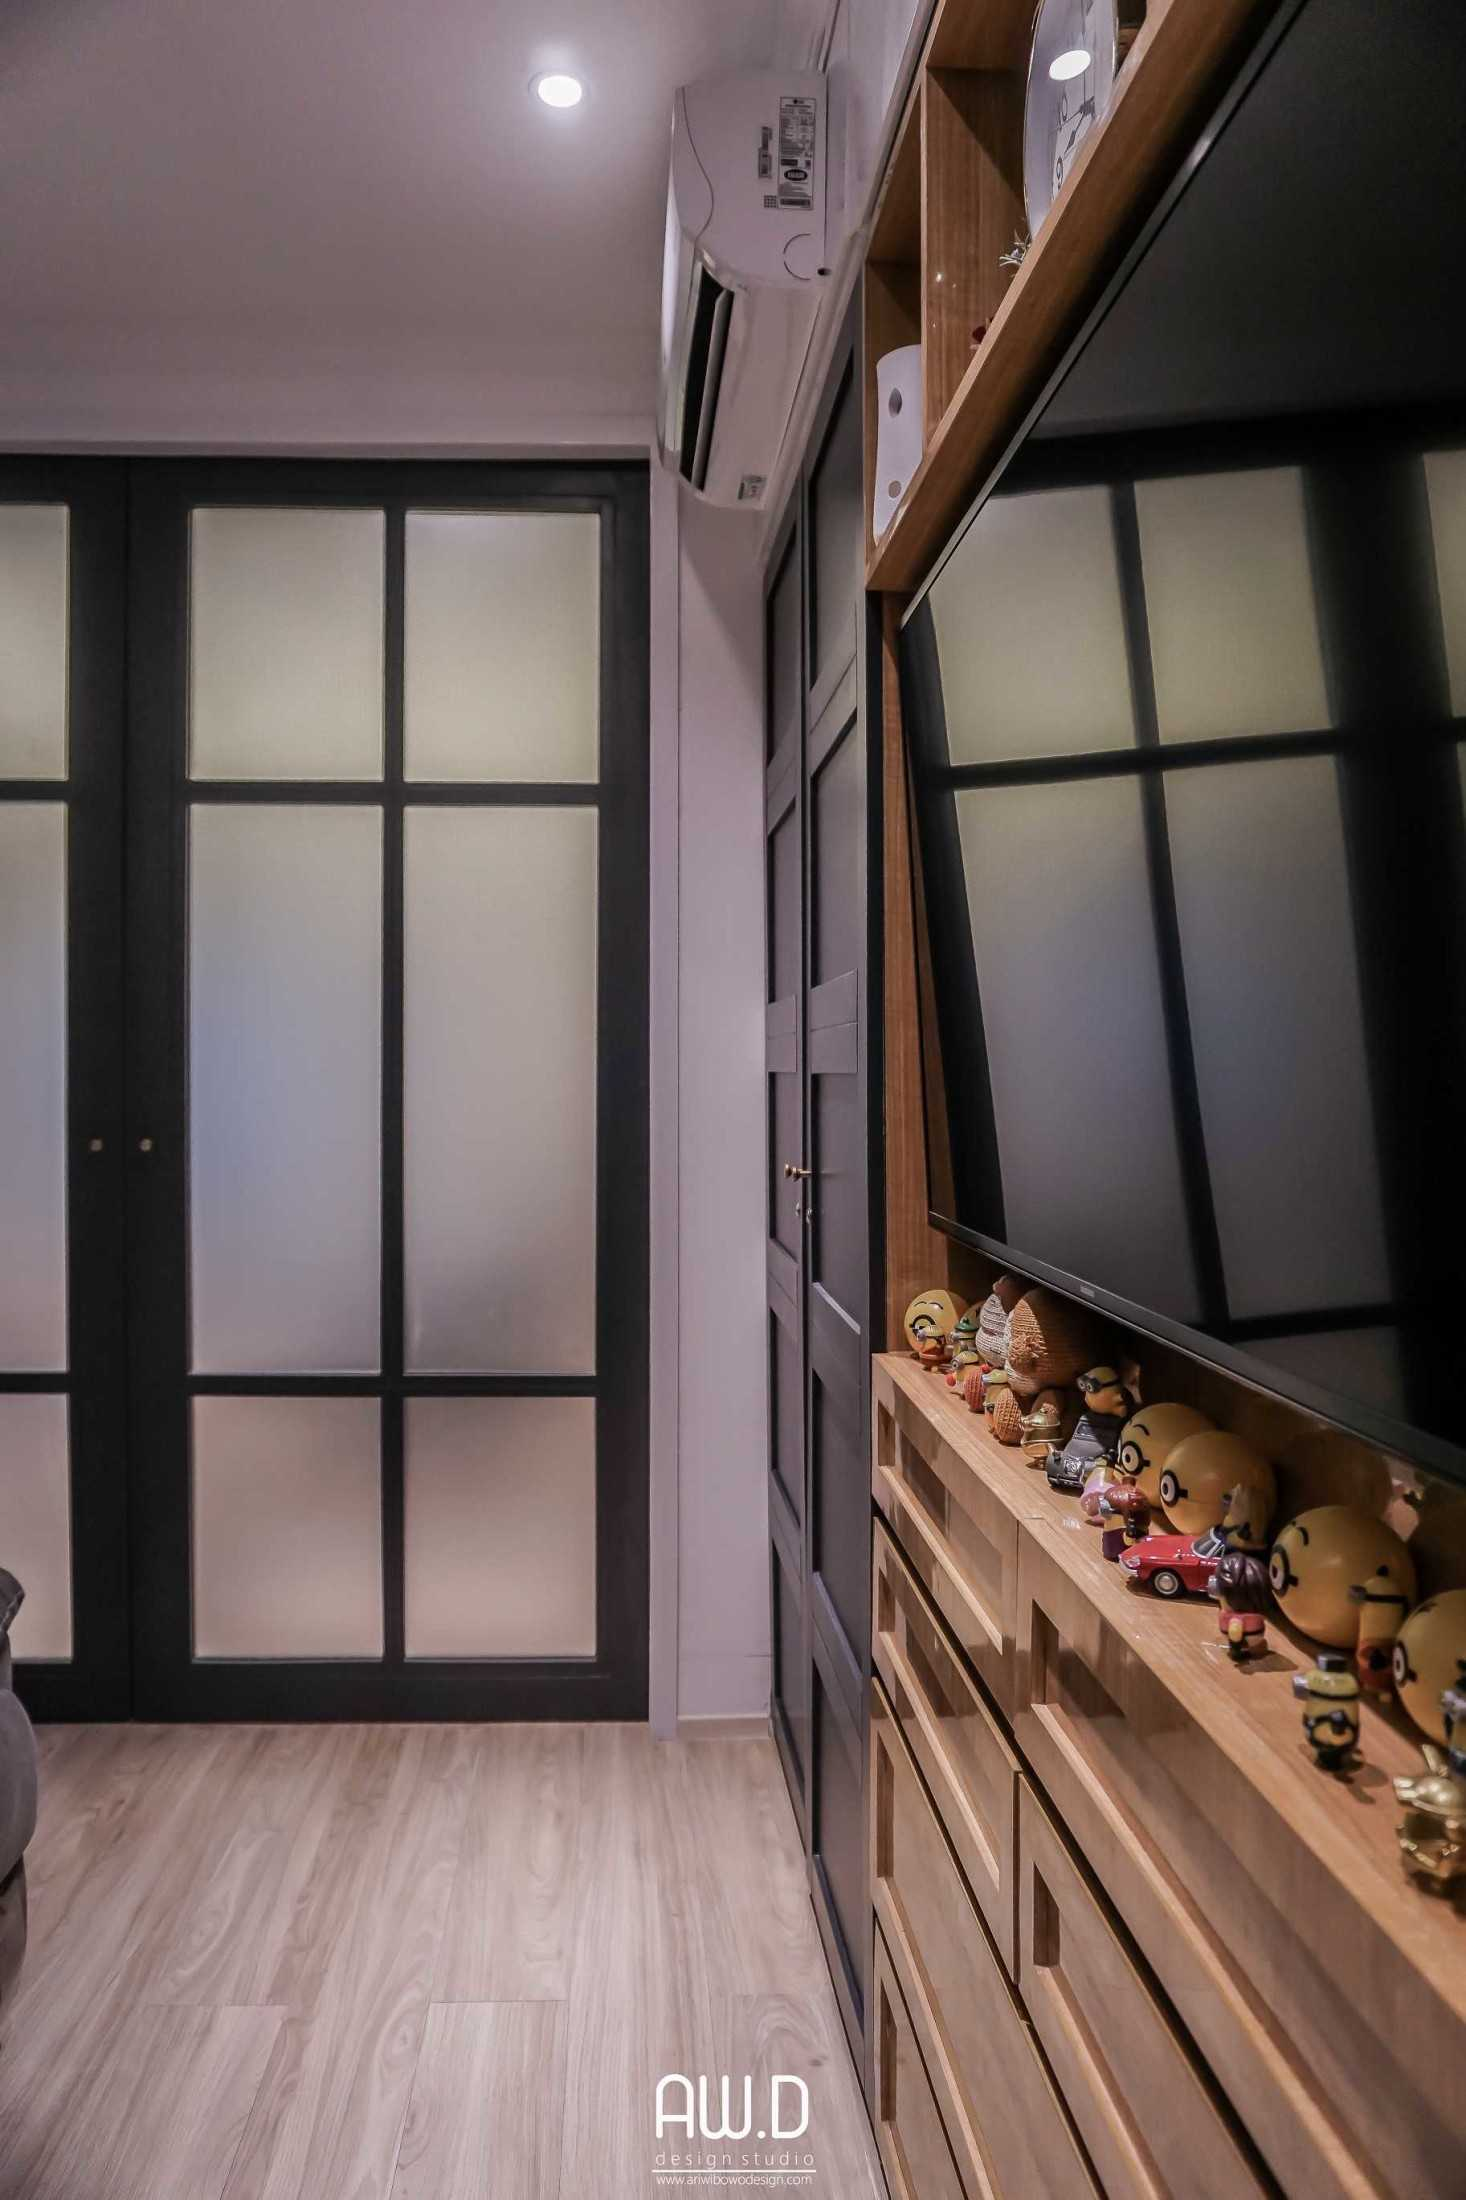 Ari Wibowo Design (Aw.d) Abd Residence Jakarta Barat, Kec. Kb. Jeruk, Kota Jakarta Barat, Daerah Khusus Ibukota Jakarta, Indonesia Jakarta Barat, Kec. Kb. Jeruk, Kota Jakarta Barat, Daerah Khusus Ibukota Jakarta, Indonesia Ari-Wibowo-Design-Awd-Abd-Residence  102062